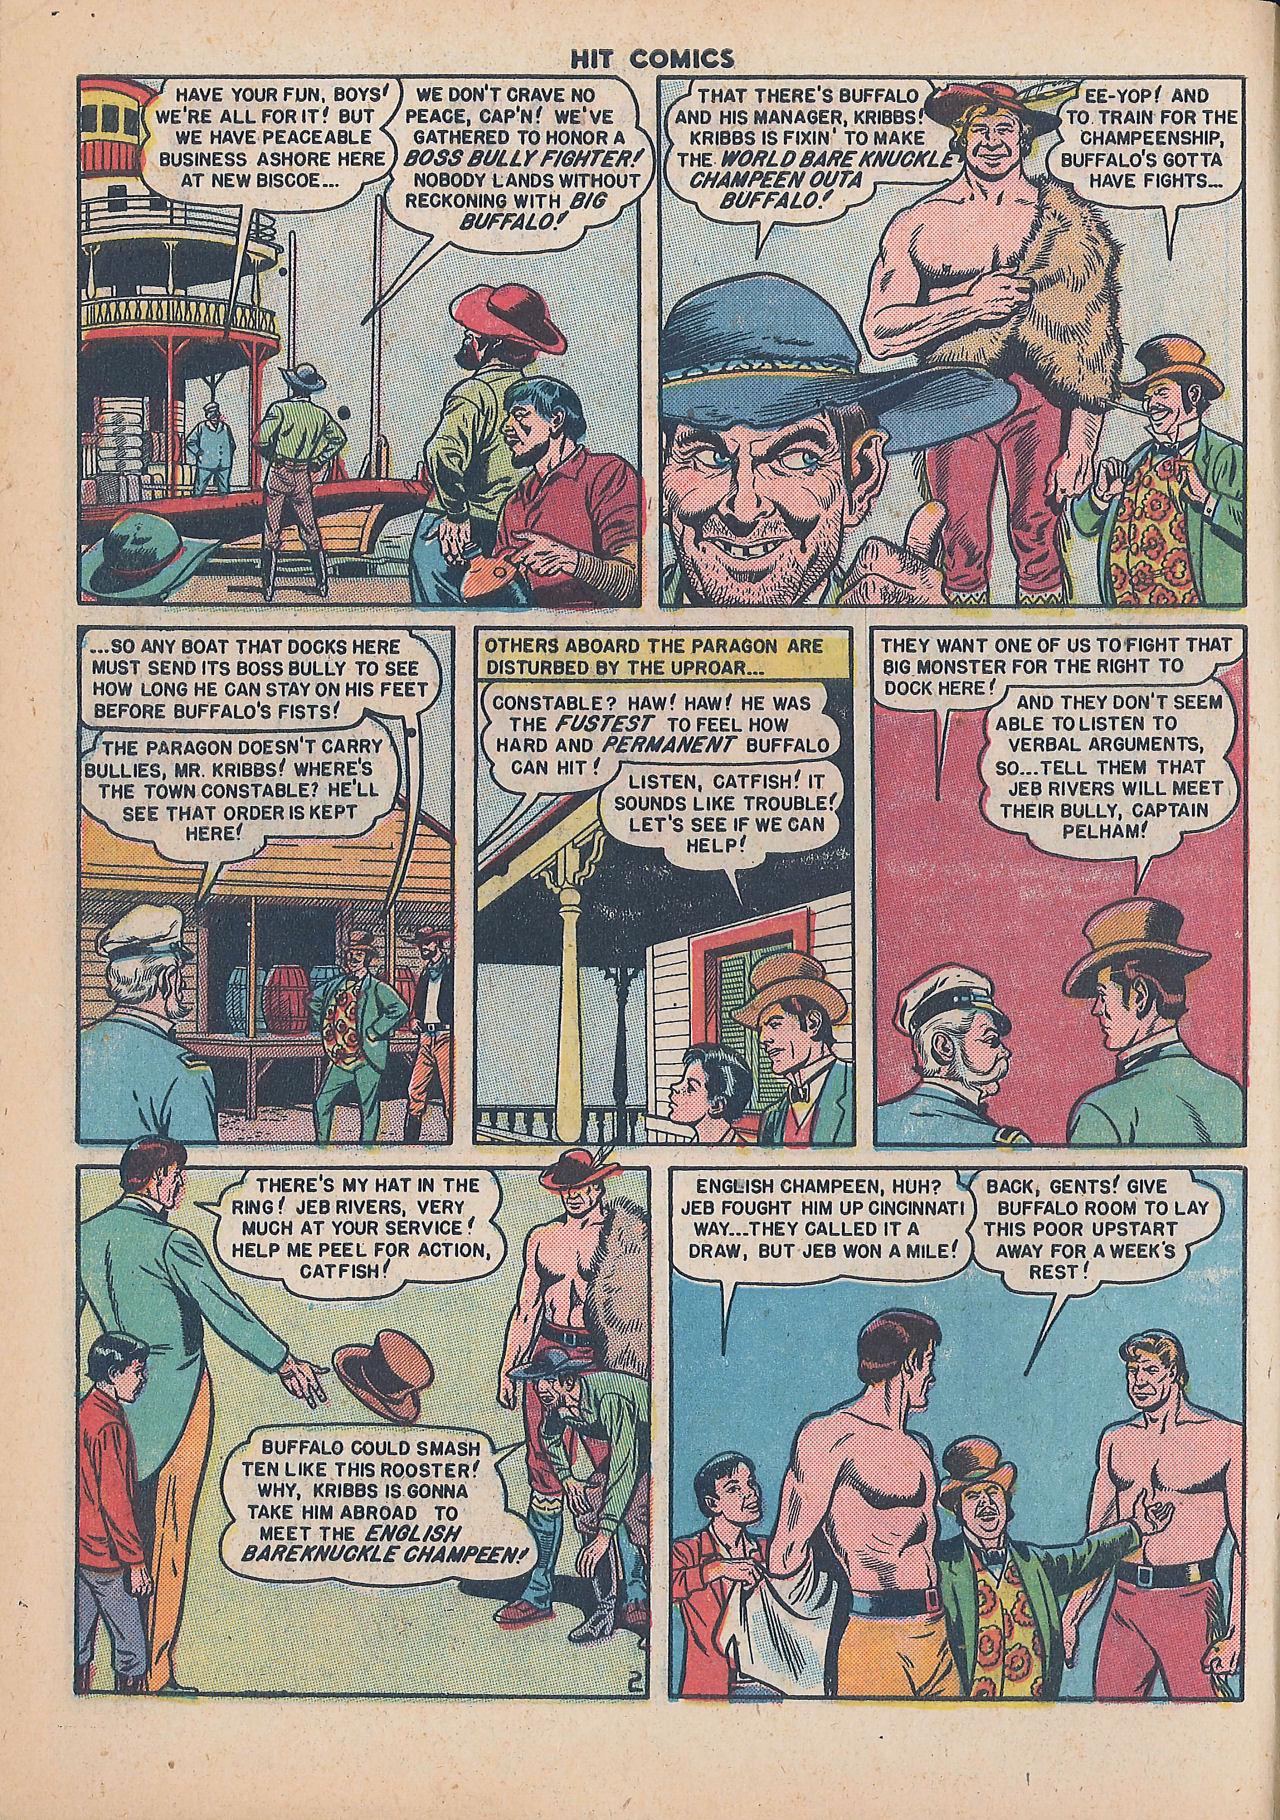 Read online Hit Comics comic -  Issue #64 - 4